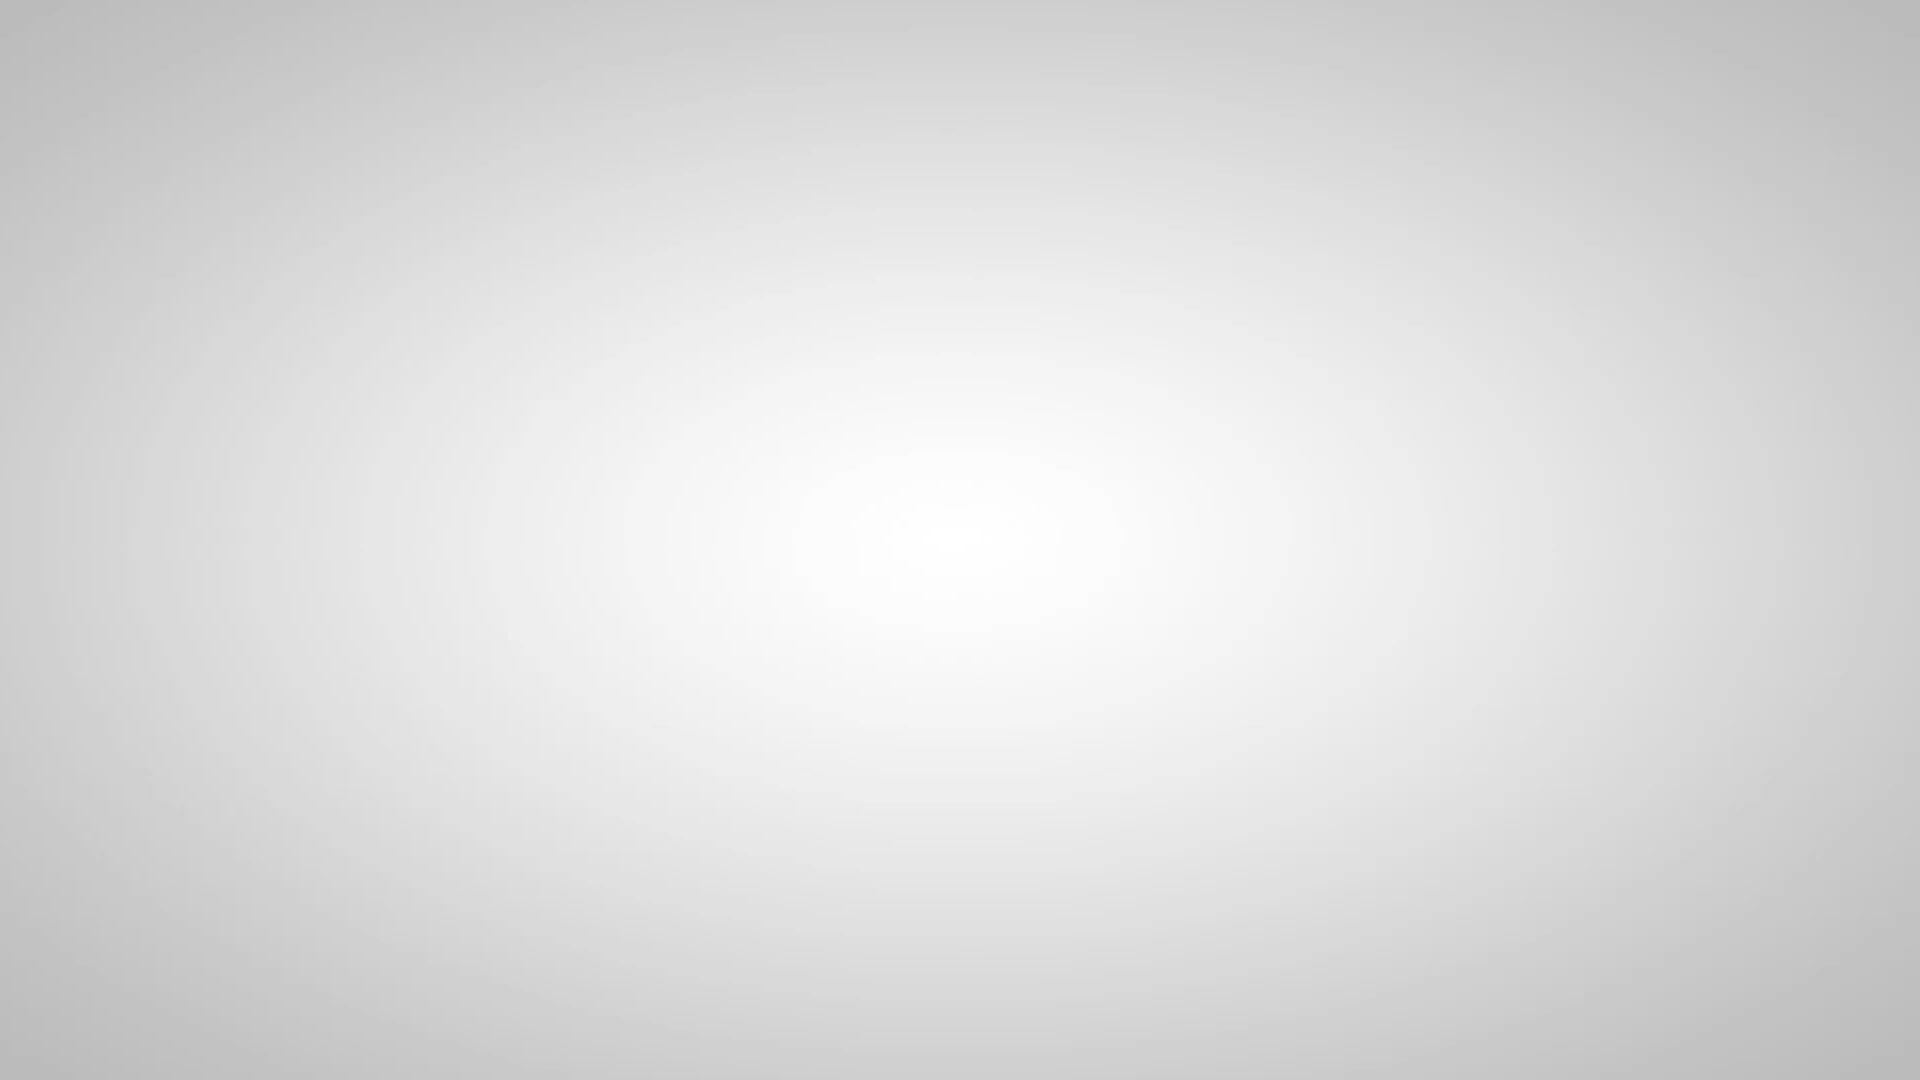 mc-design-blank-screenshot